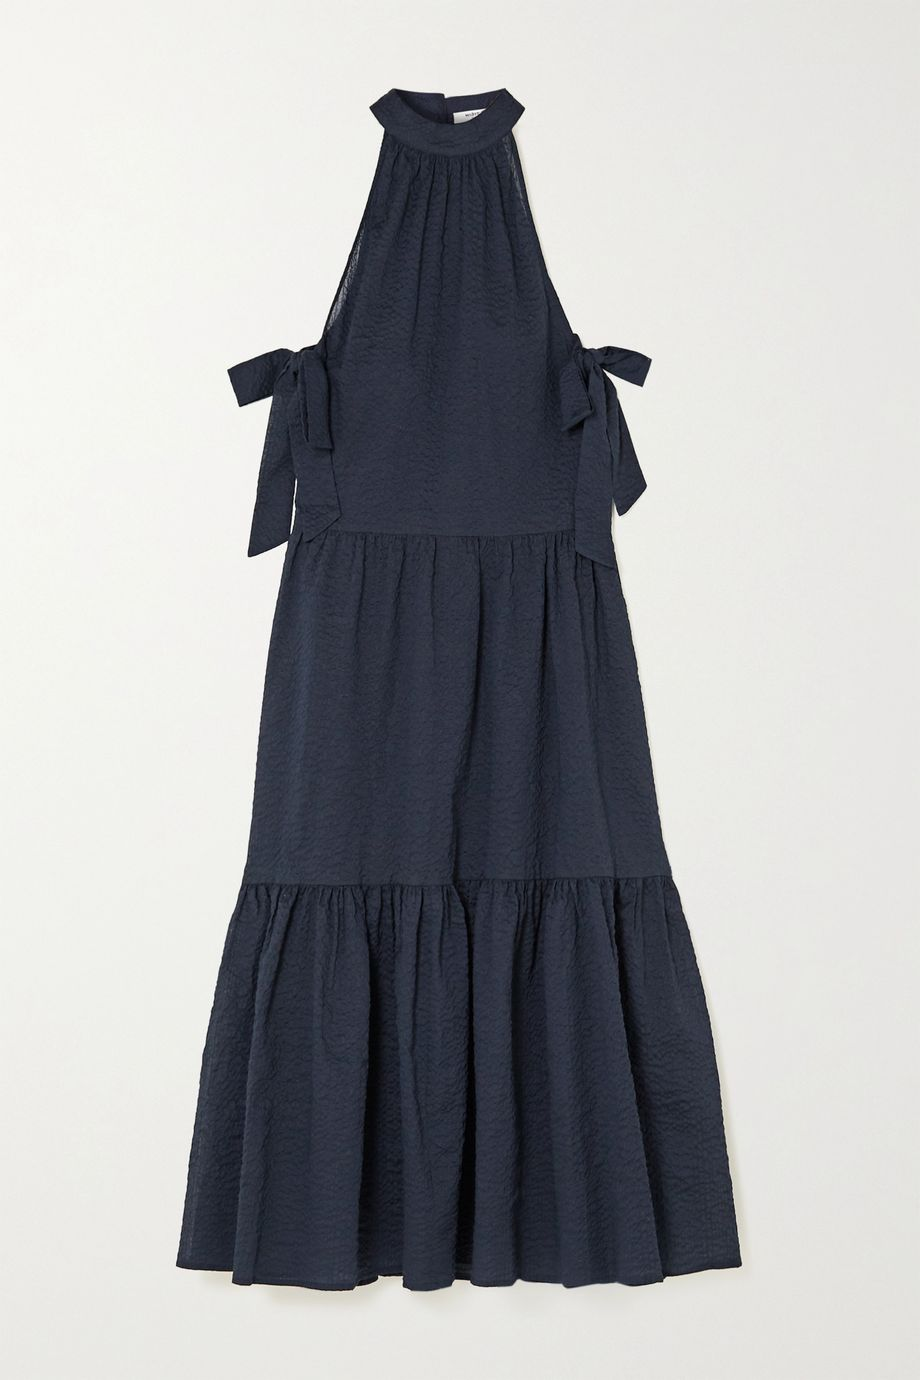 Marysia Molluscs tiered crinkled cotton-gauze midi dress